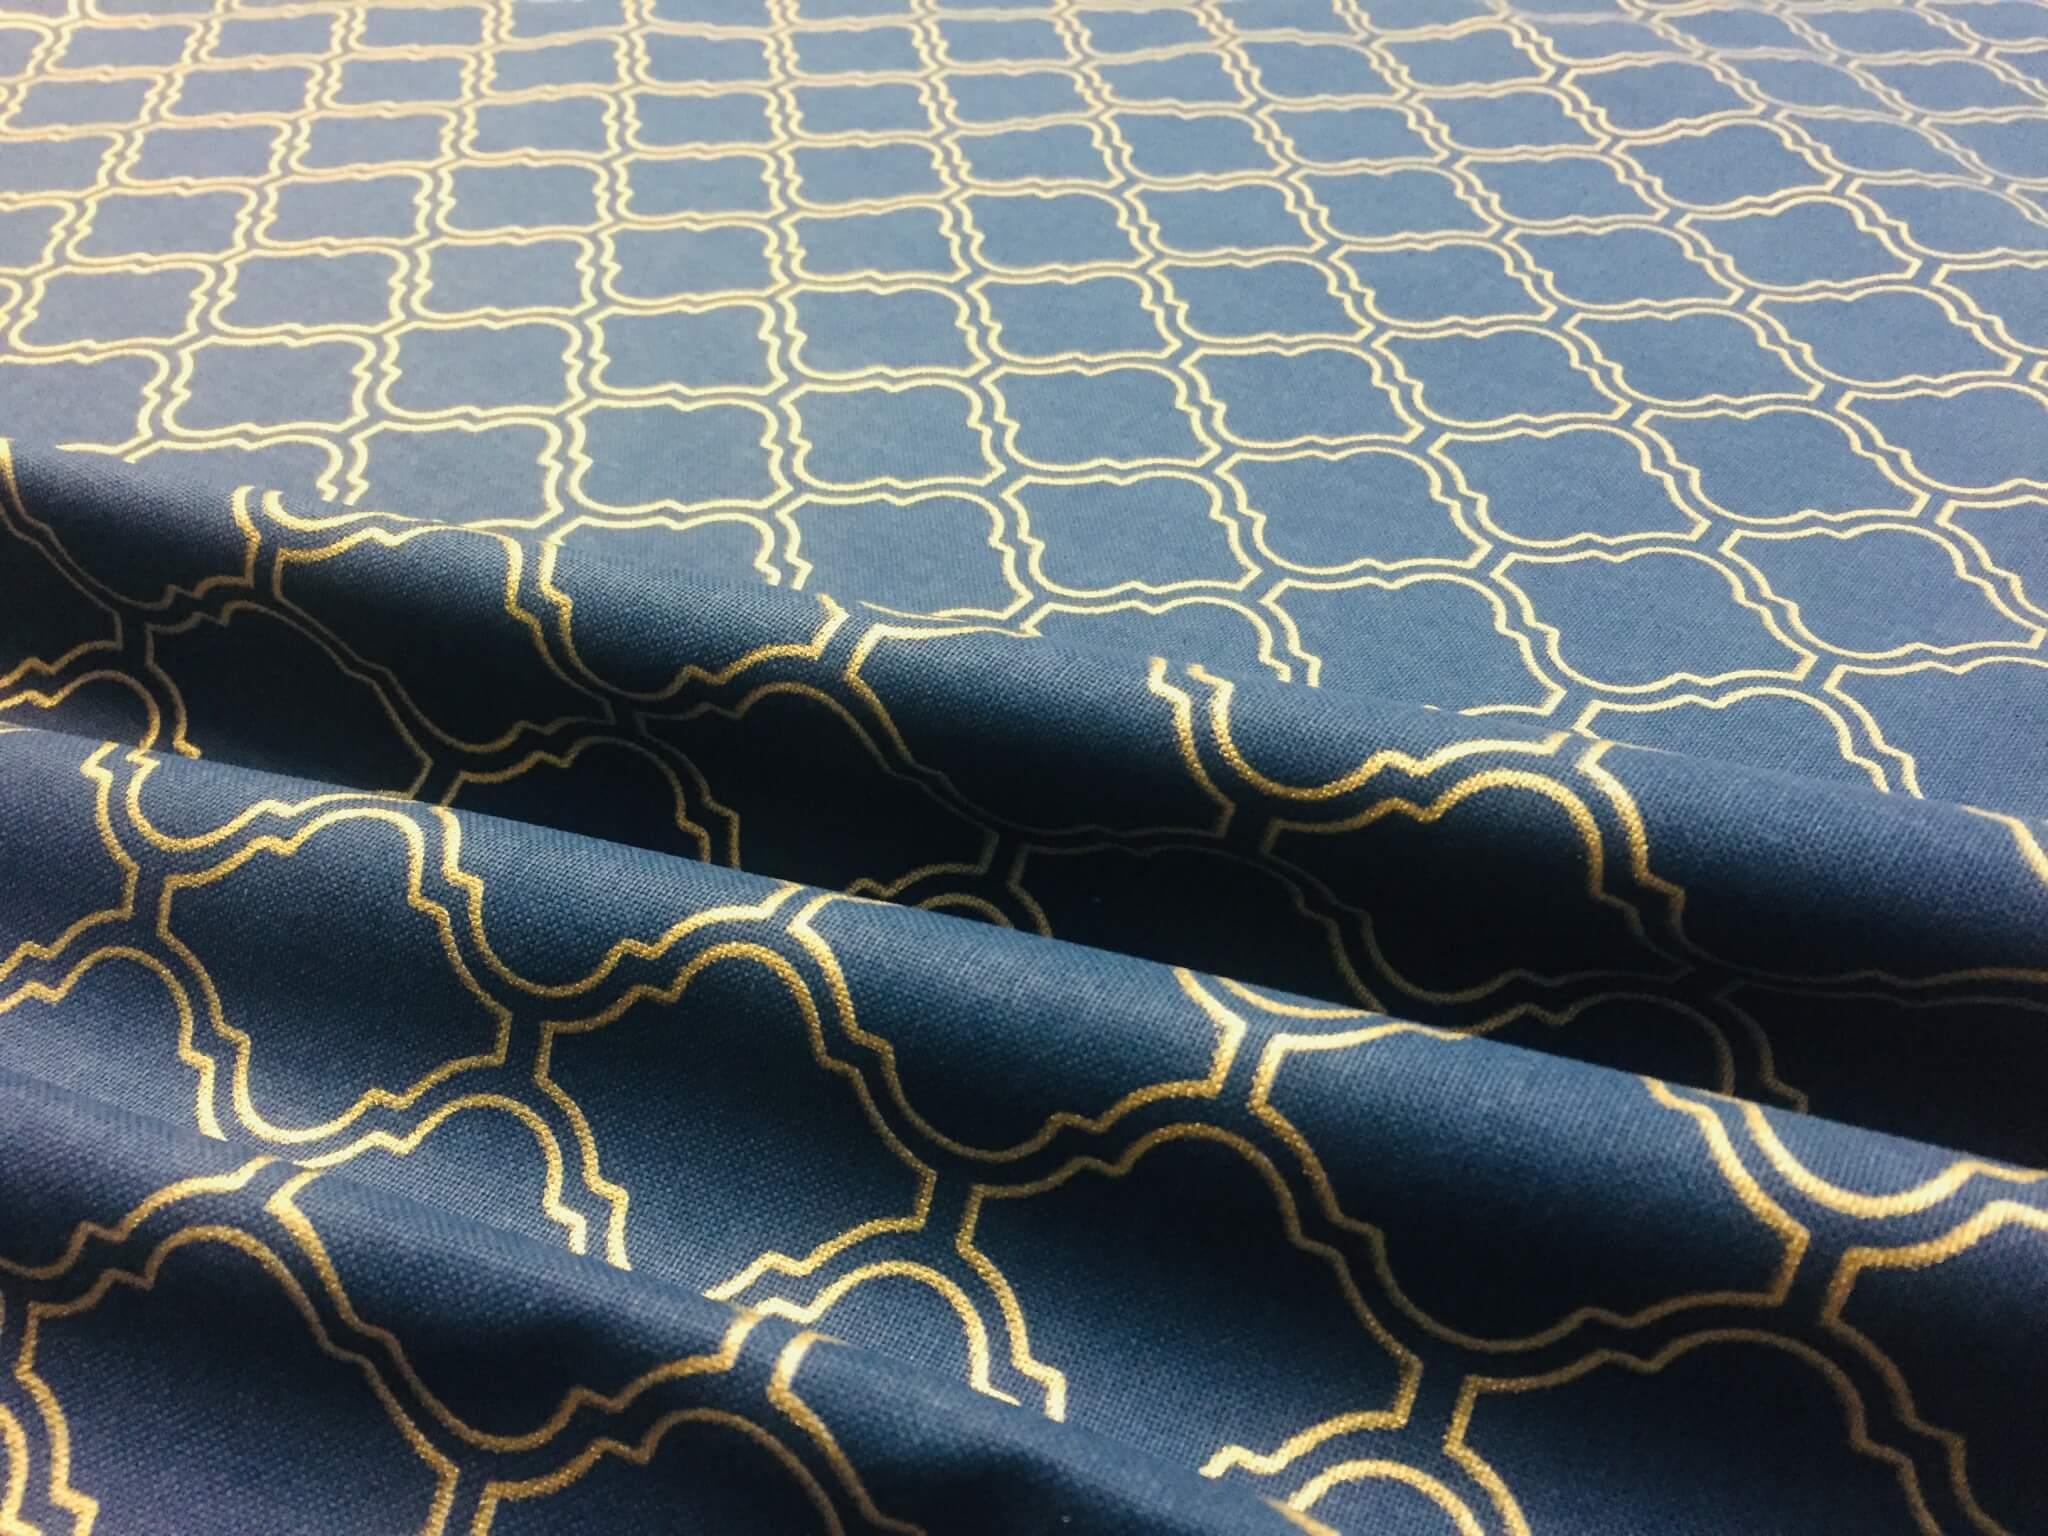 Gold Moroccan Arabic Damask Print Navy Blue Fabric ...